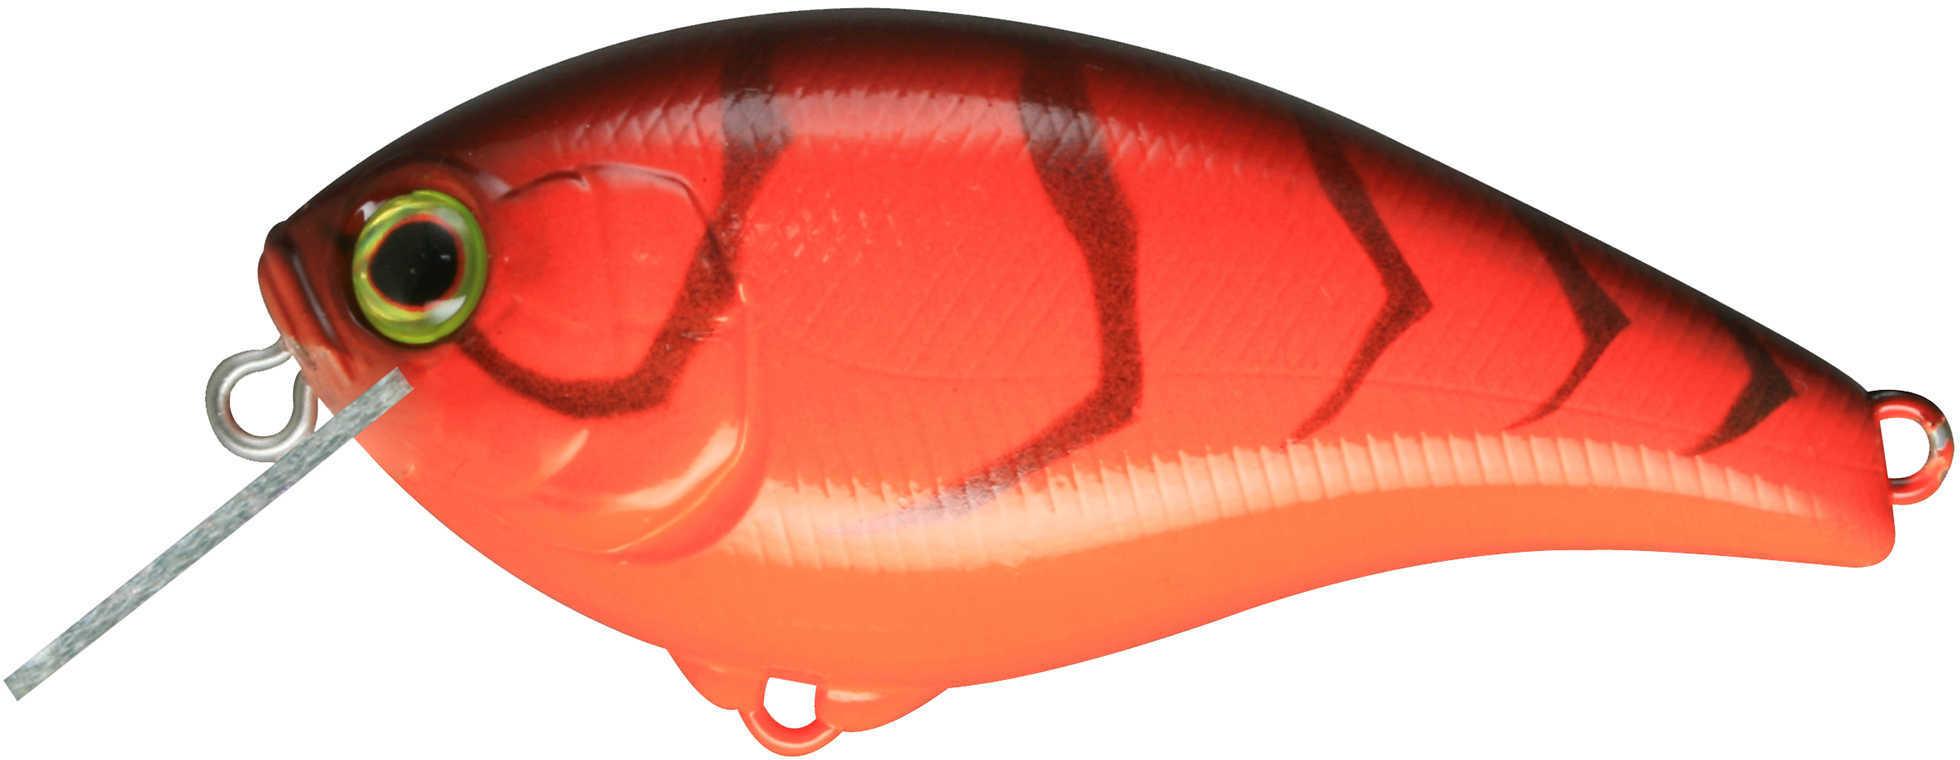 Jackall Lures Aska60 SR Hard Crank Bait Lure 2.5-Inch Body Length, 4' Depth, 3/8 oz, Crawfish, Per 1 Md: JASK60SR-CRA